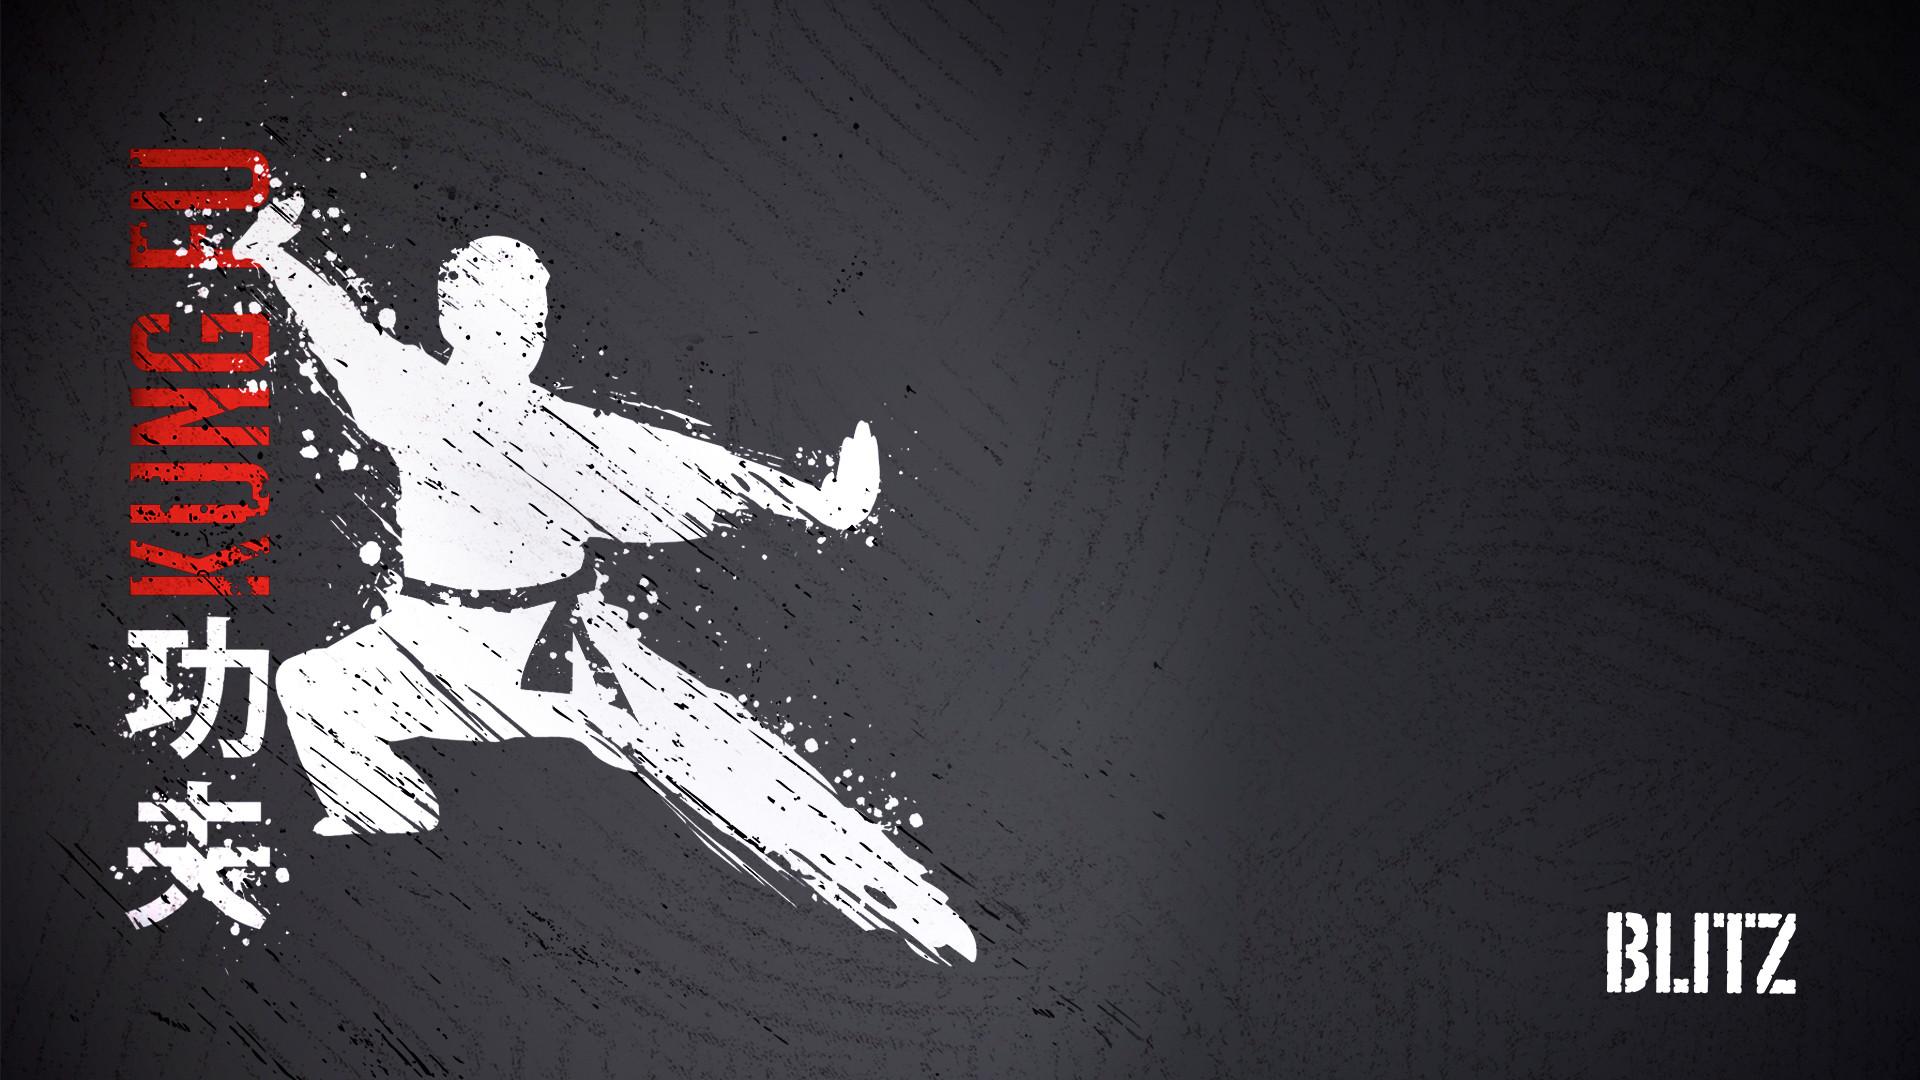 Taekwondo Itf Wallpaper 3d Shaolin Kung Fu Wallpaper 71 Images